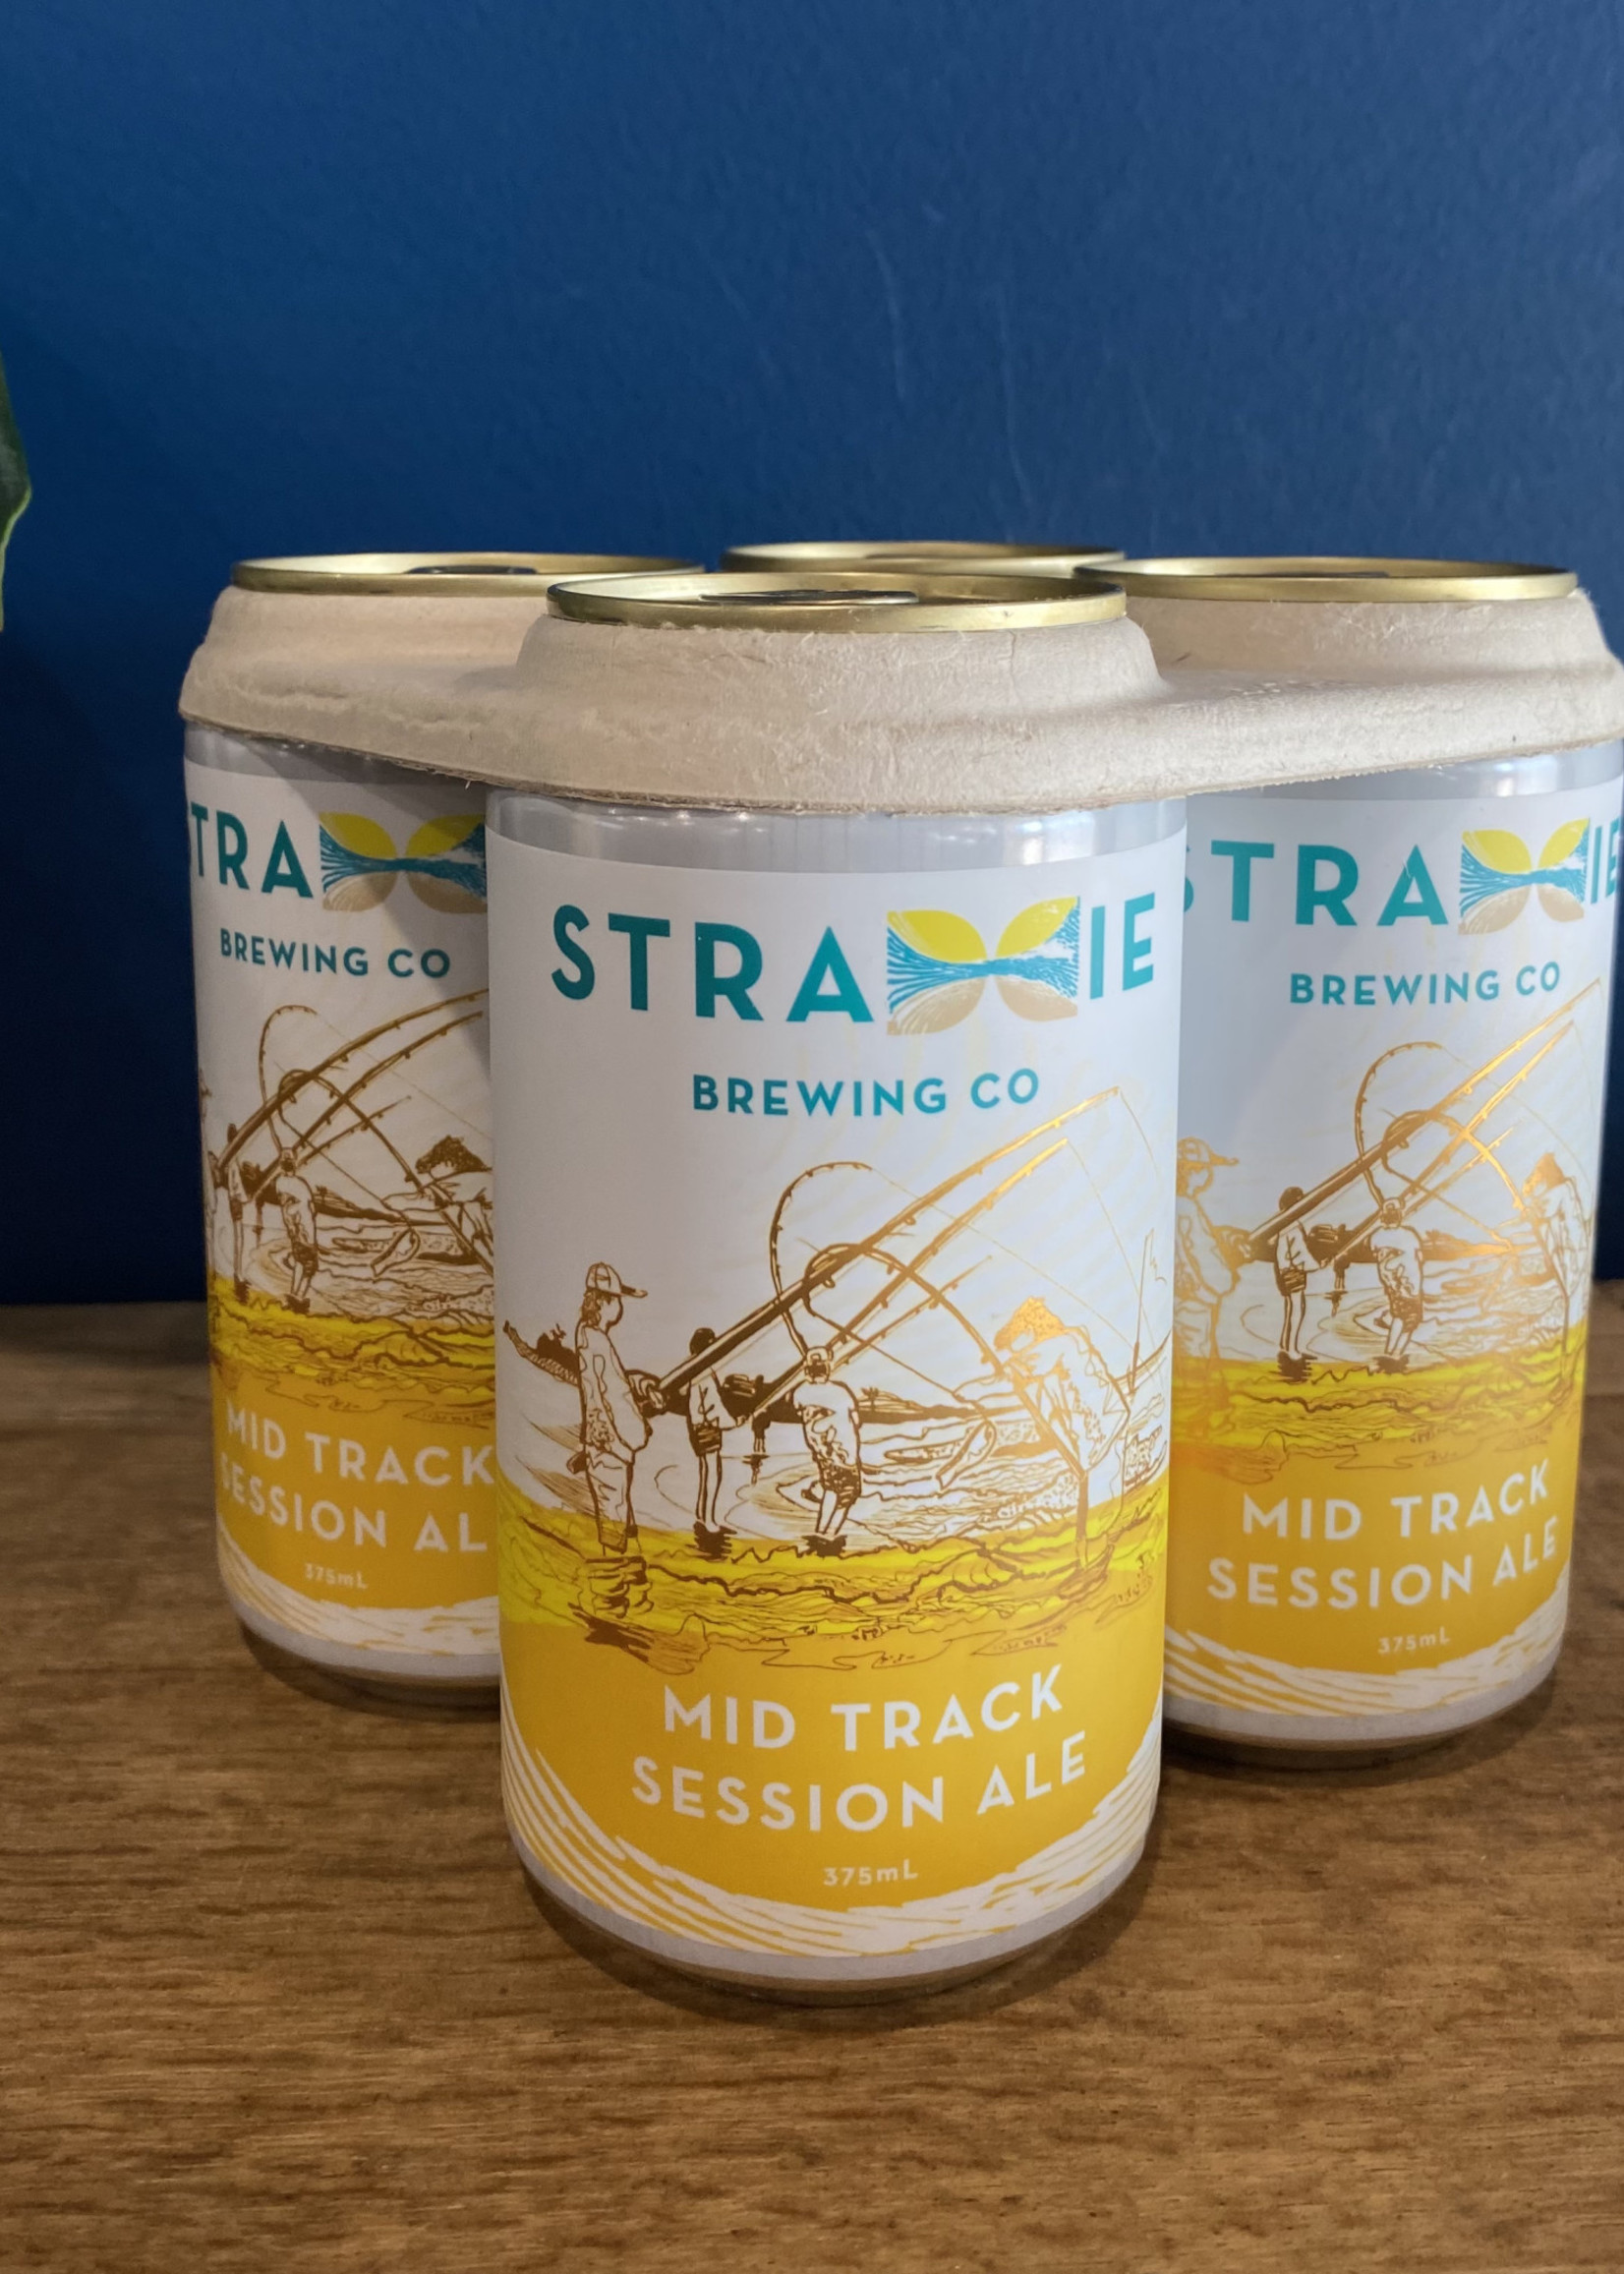 Stradbroke Brewing Co. Mid Track Session Ale